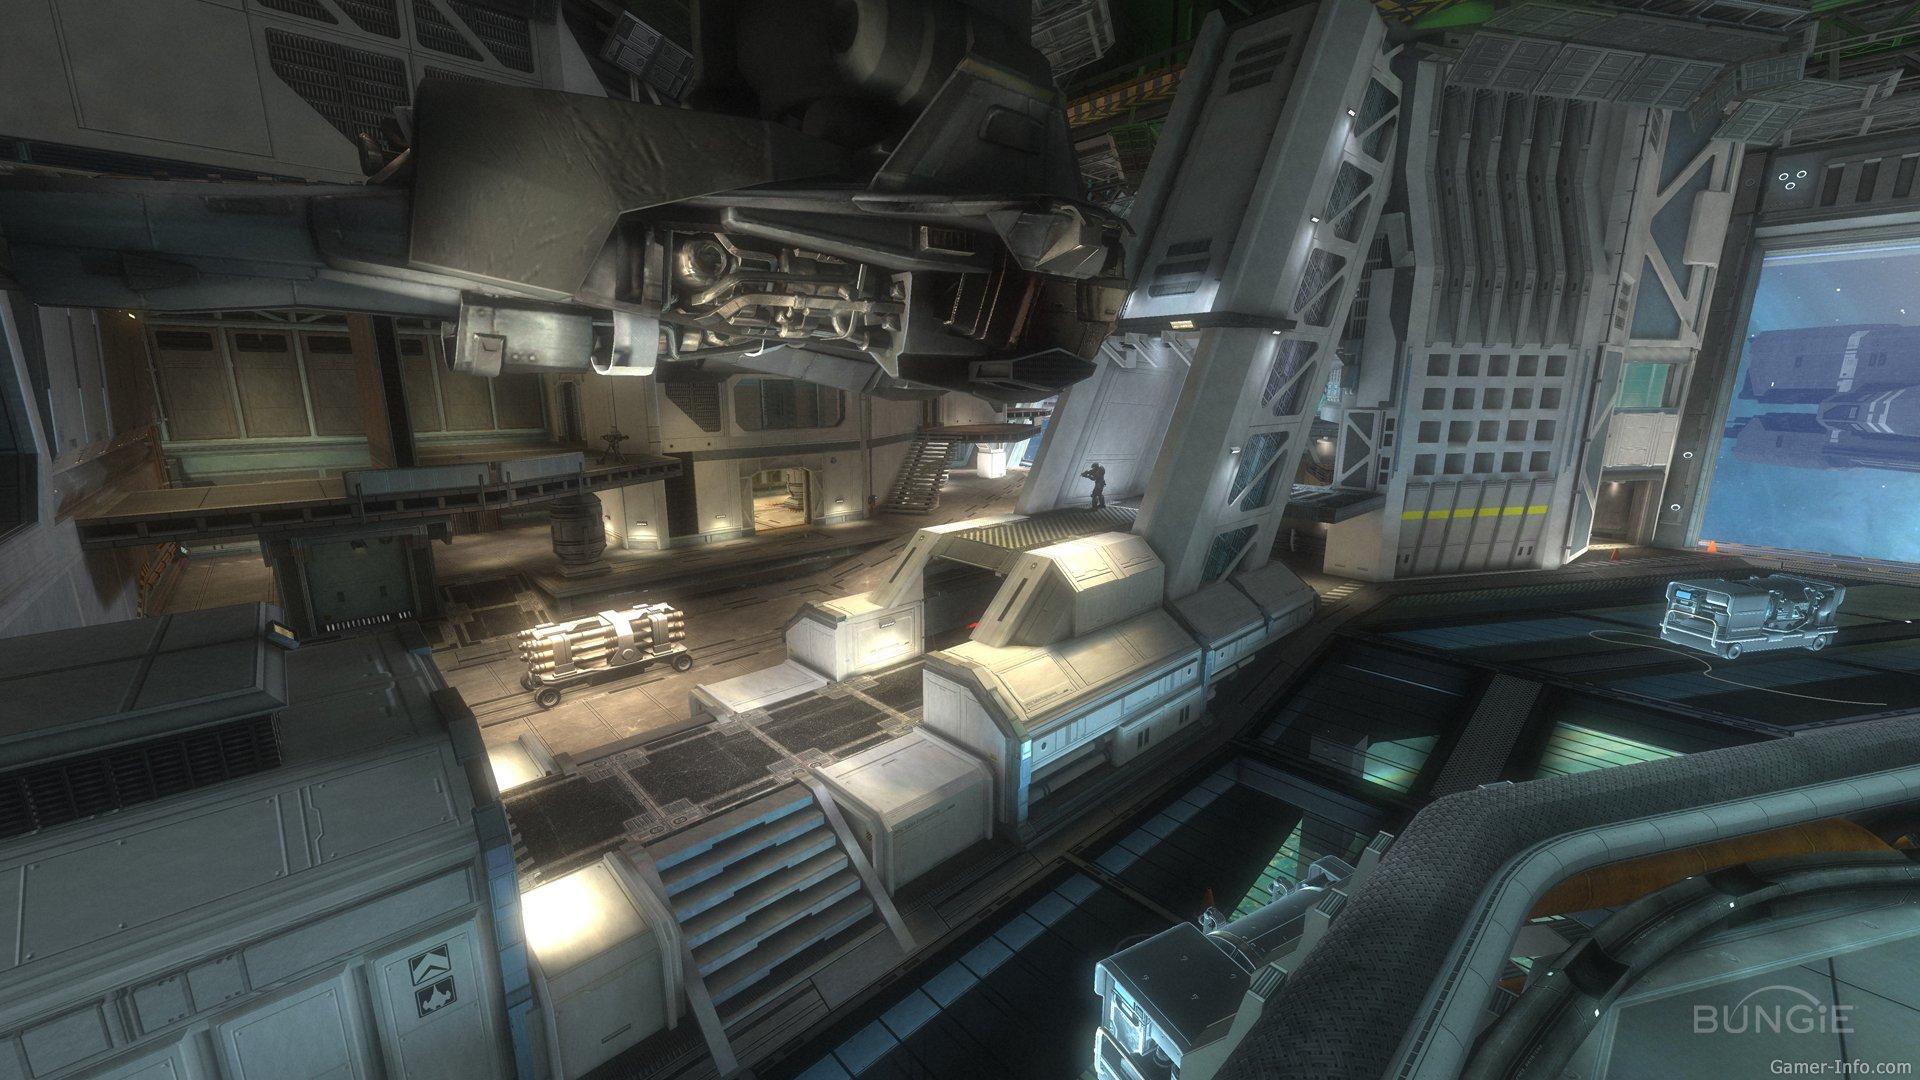 Halo: Reach скоро появится на ПК и Xbox One